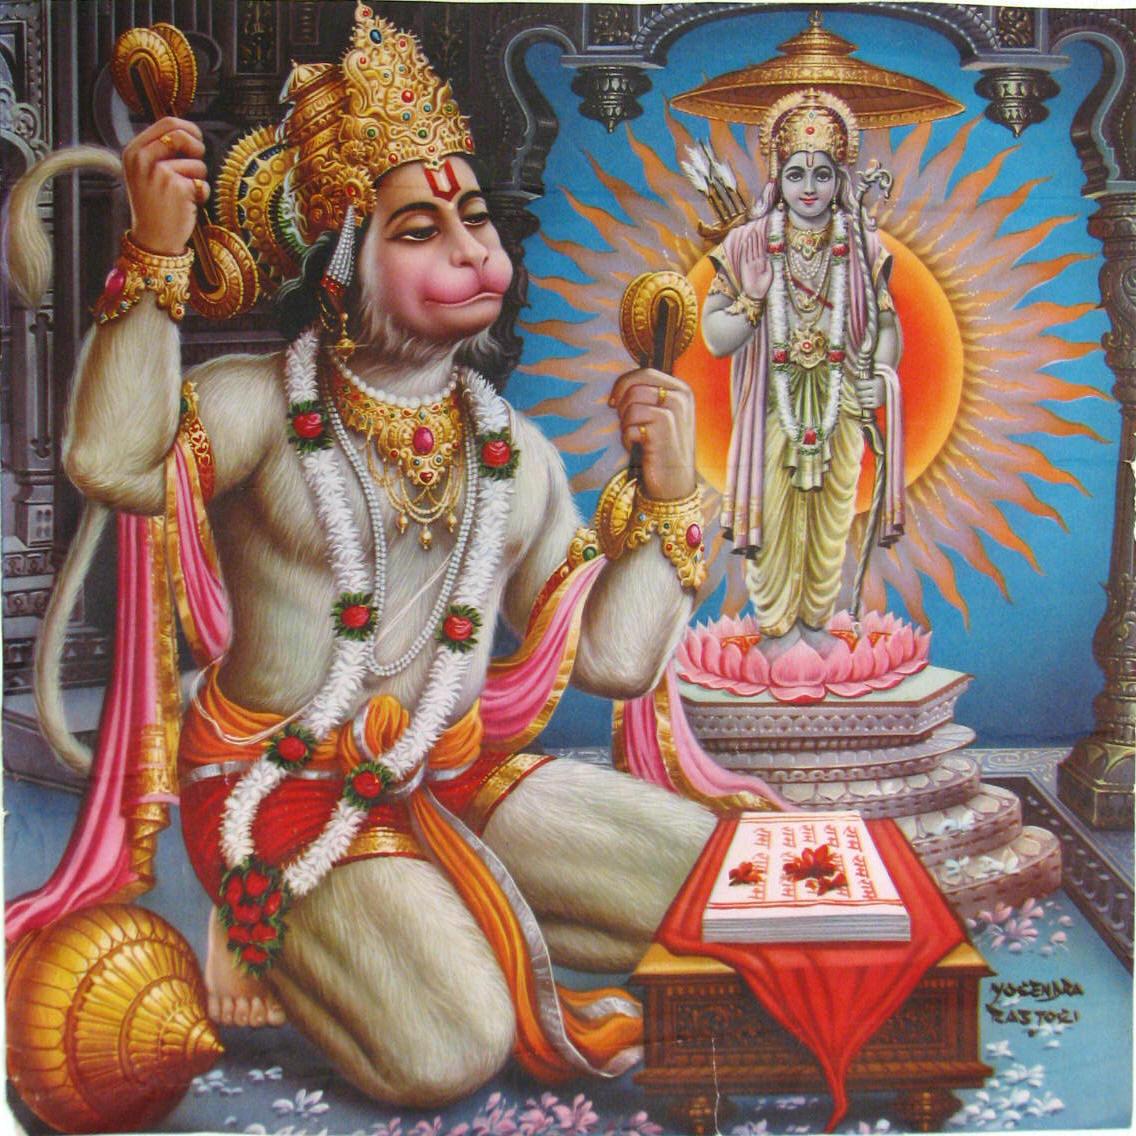 http://1.bp.blogspot.com/-bN-FmpUlNP0/T9hfj6LJwoI/AAAAAAAAAT4/W_8u4uw_NaU/s1600/SankatMochak+Hanuman+Photos.jpg